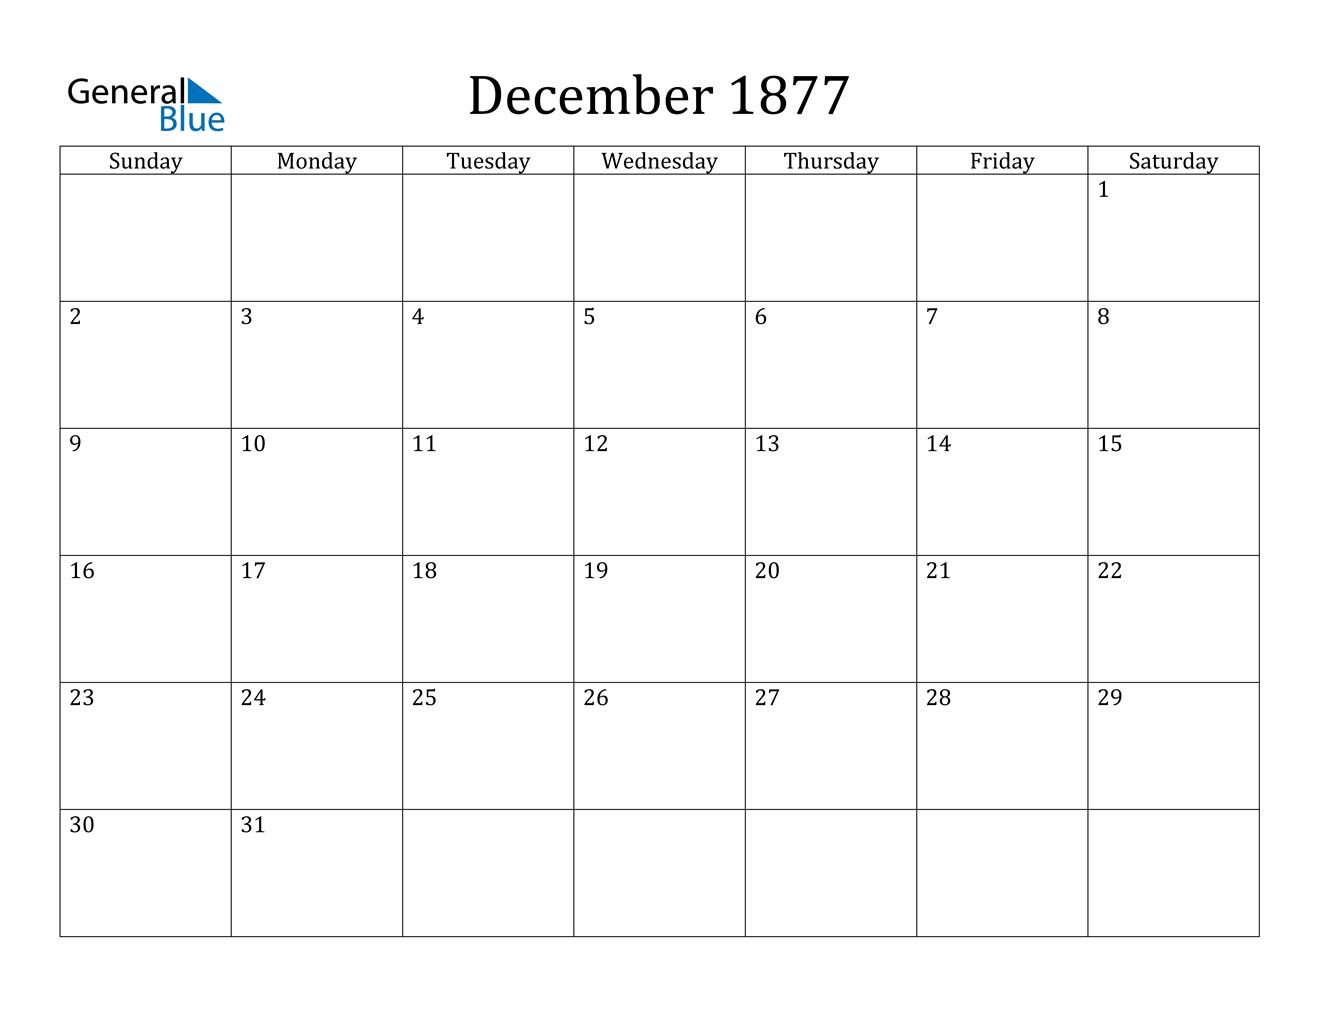 Image of December 1877 Calendar